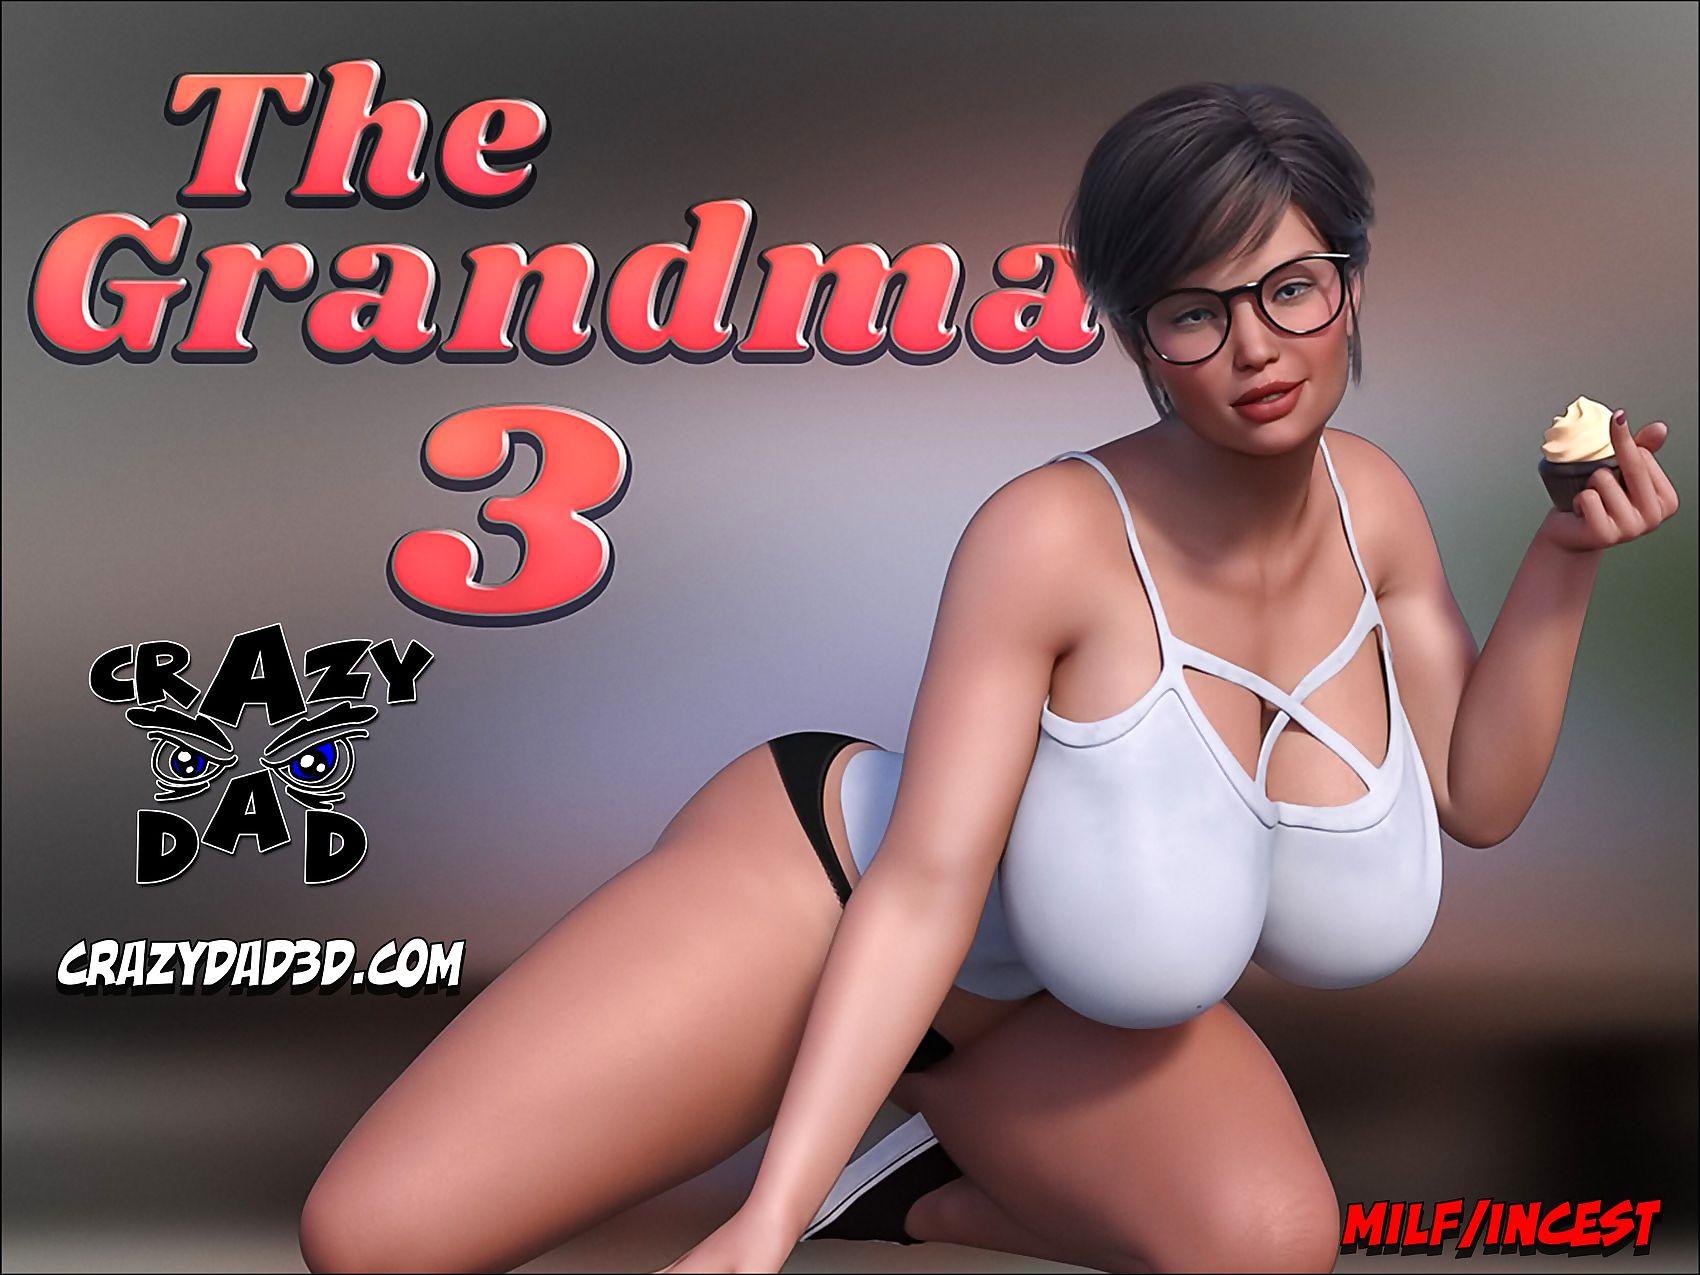 CrazyDad- Eradicate affect Grandma 3